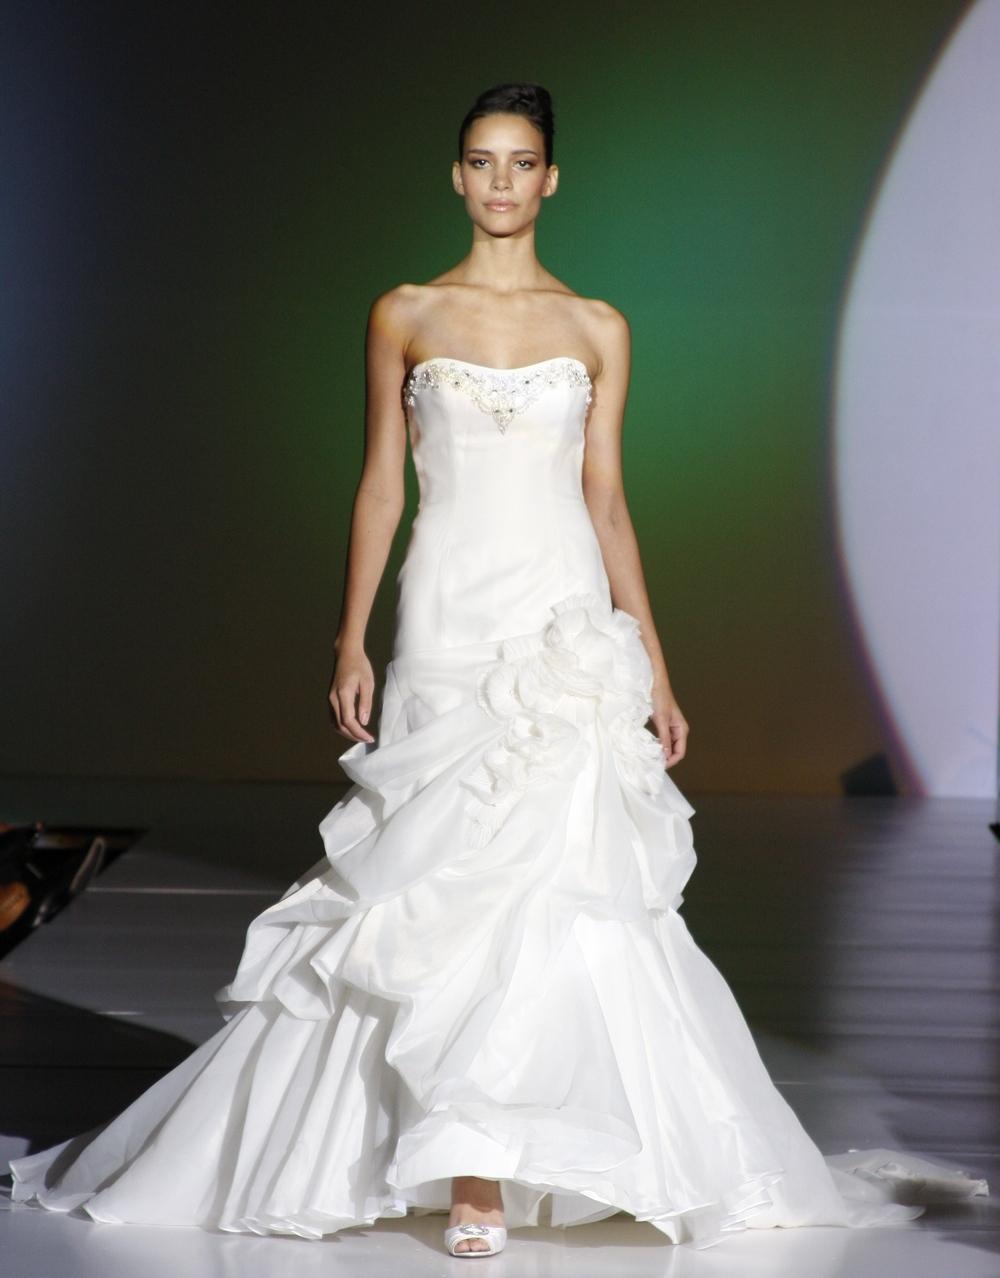 Blue-by-enzoani-spring-2011-wedding-dresses-dominica-silk-organza-a-line-strapless-wedding-dress-bustle-beading.full